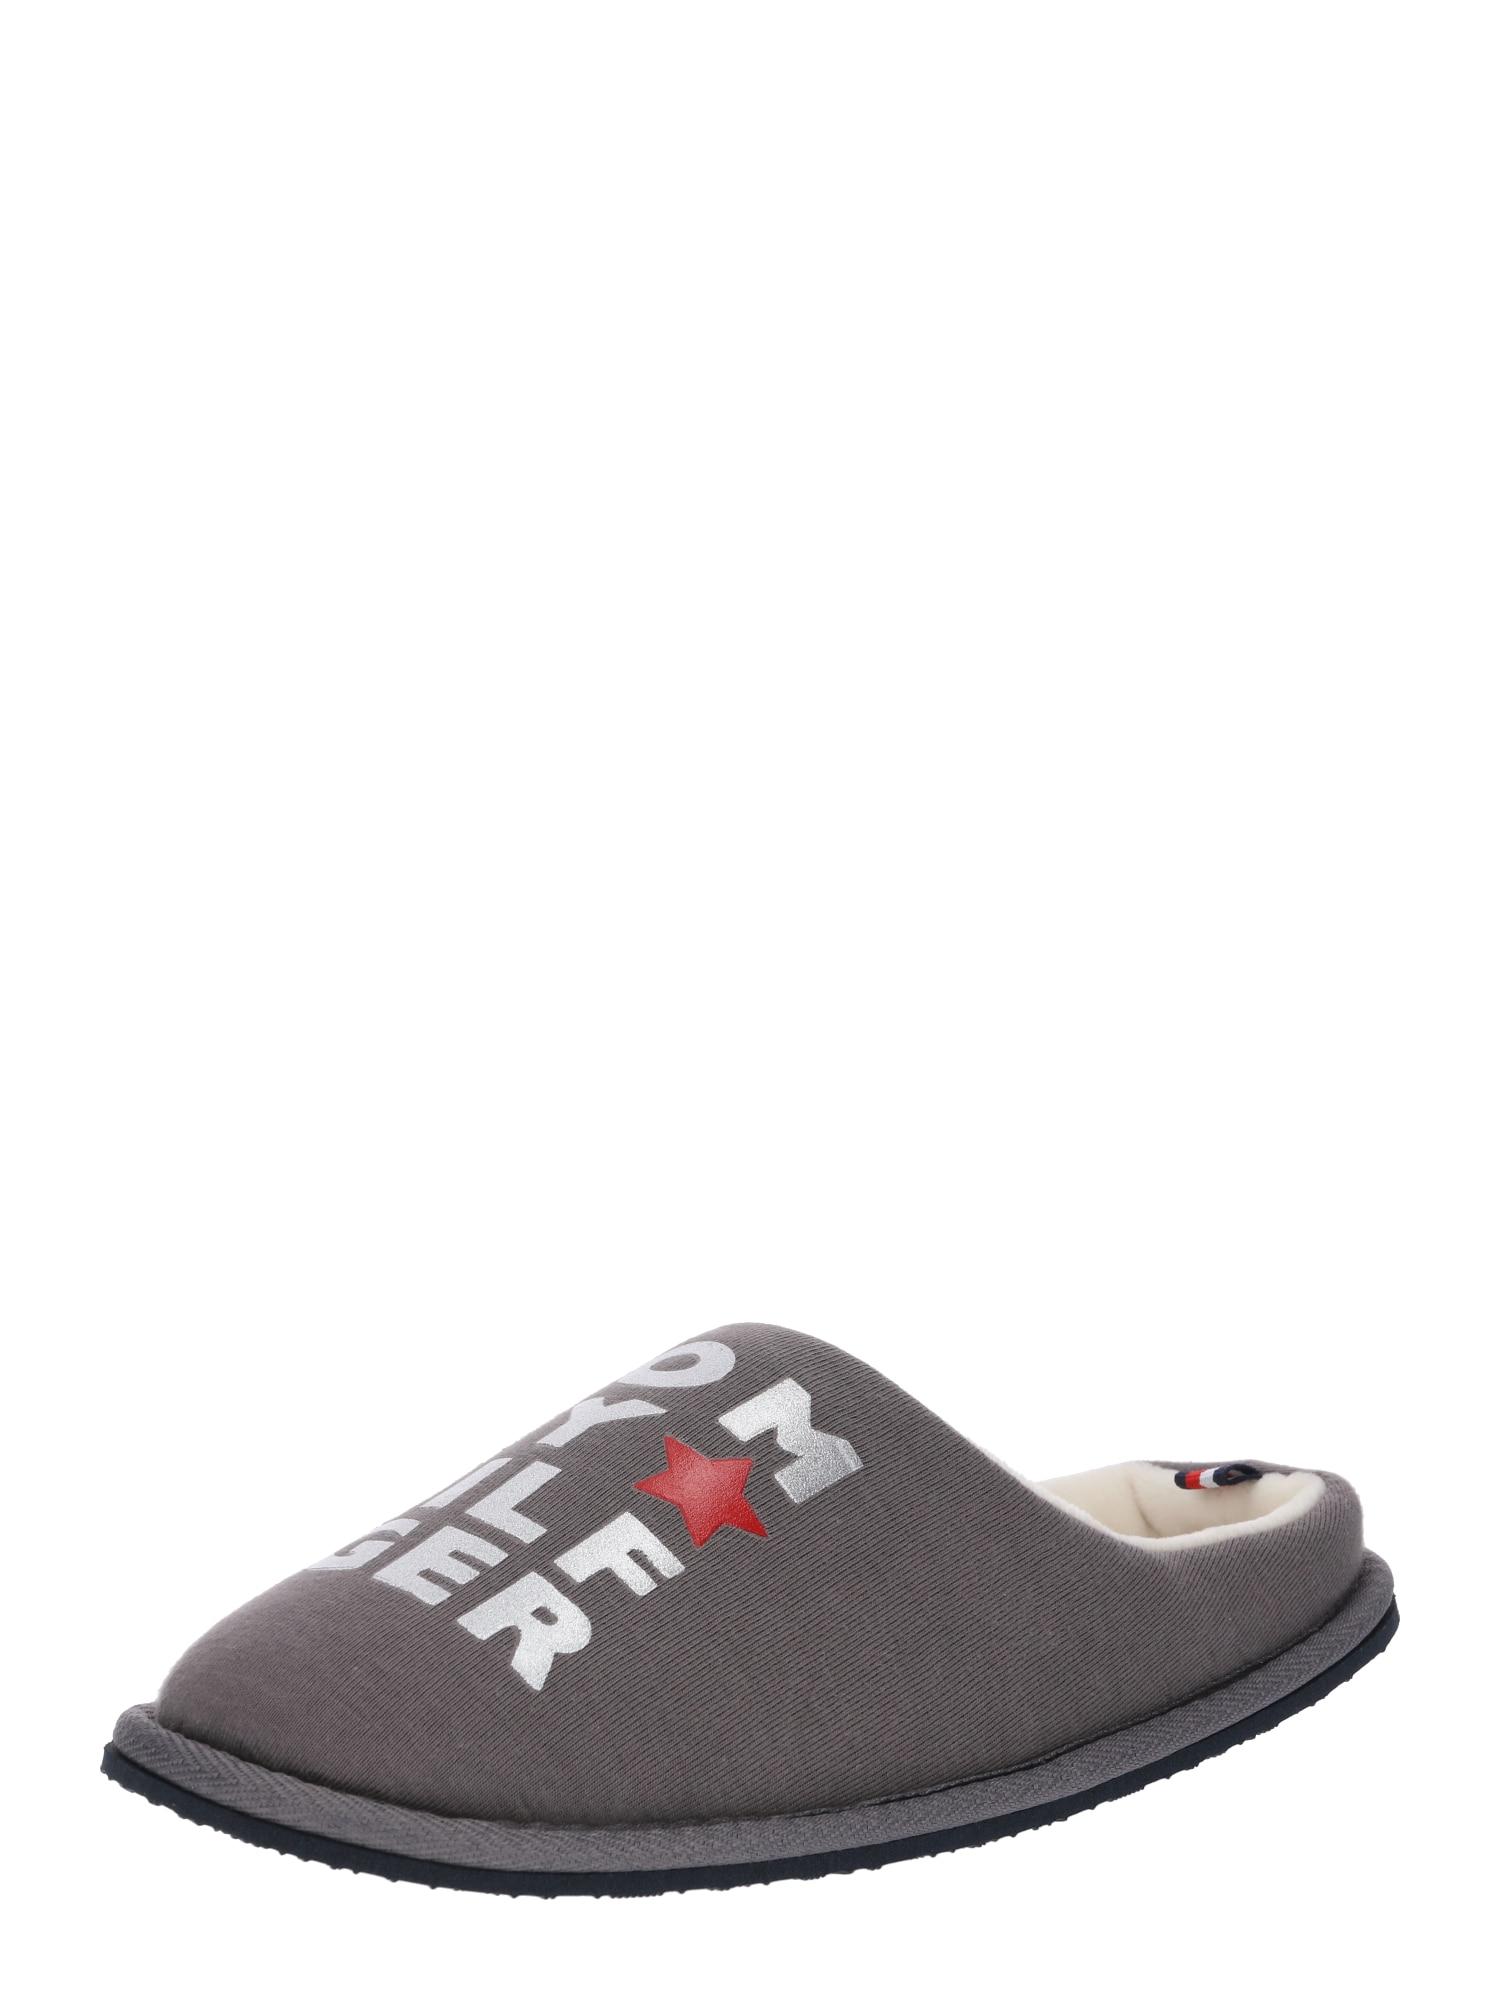 Pantofle METALLIC PRINT HOME šedá červená TOMMY HILFIGER